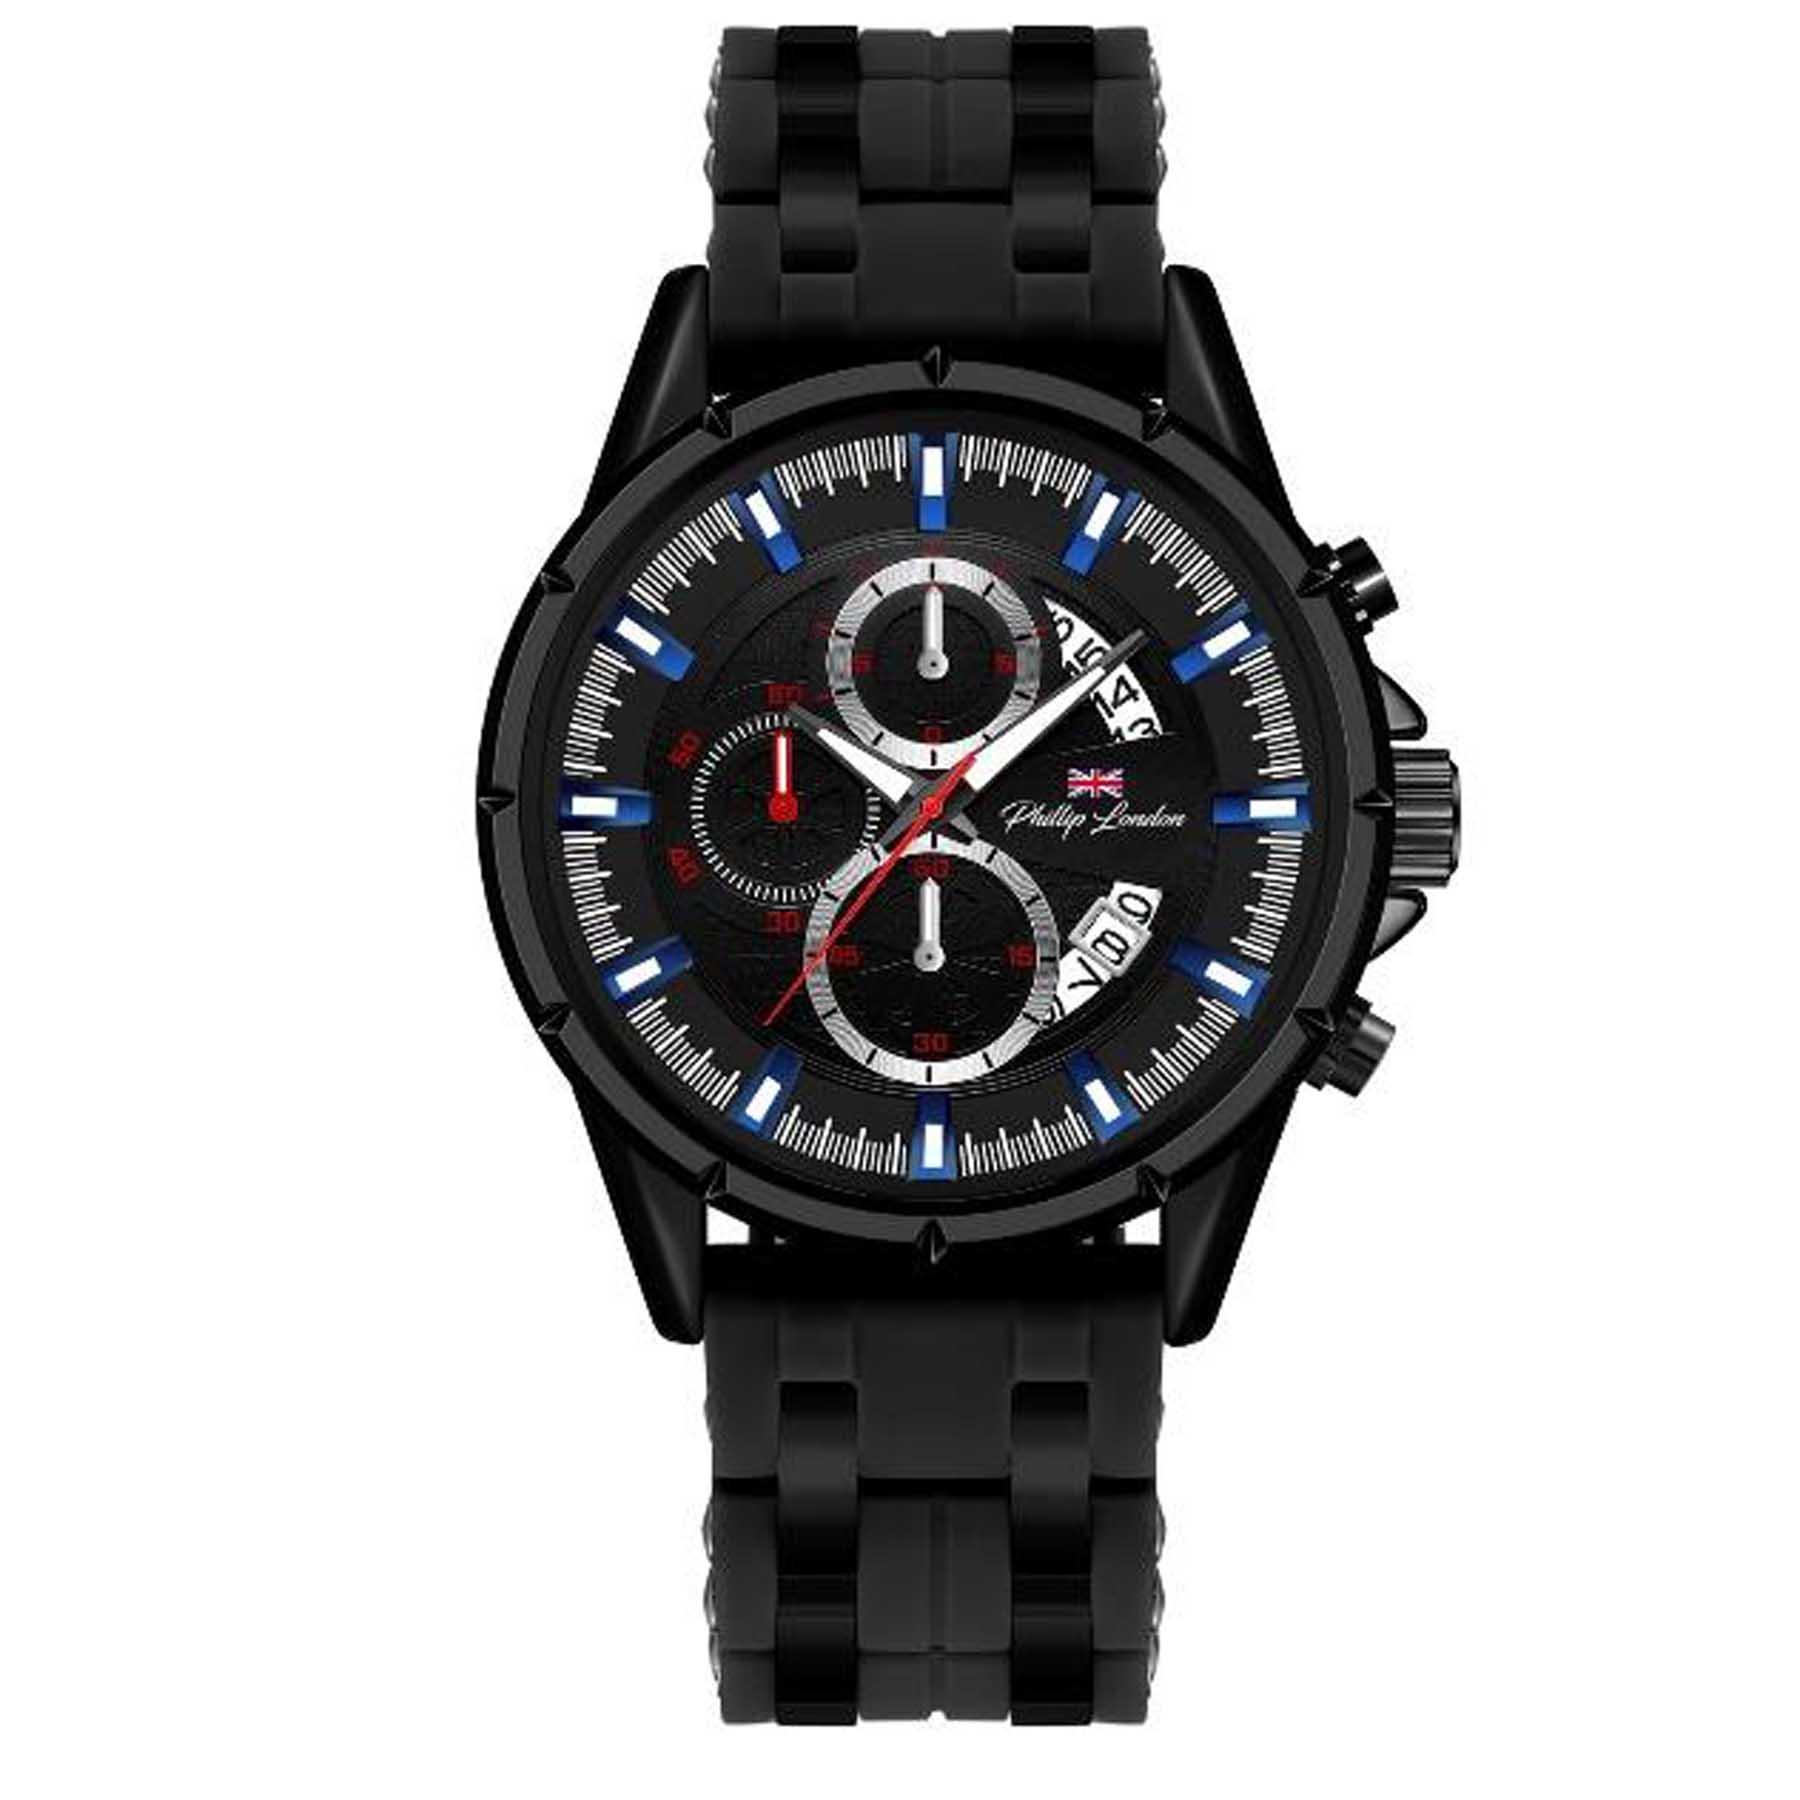 Relógio Philiph London Analógico Masculino PL80179619M